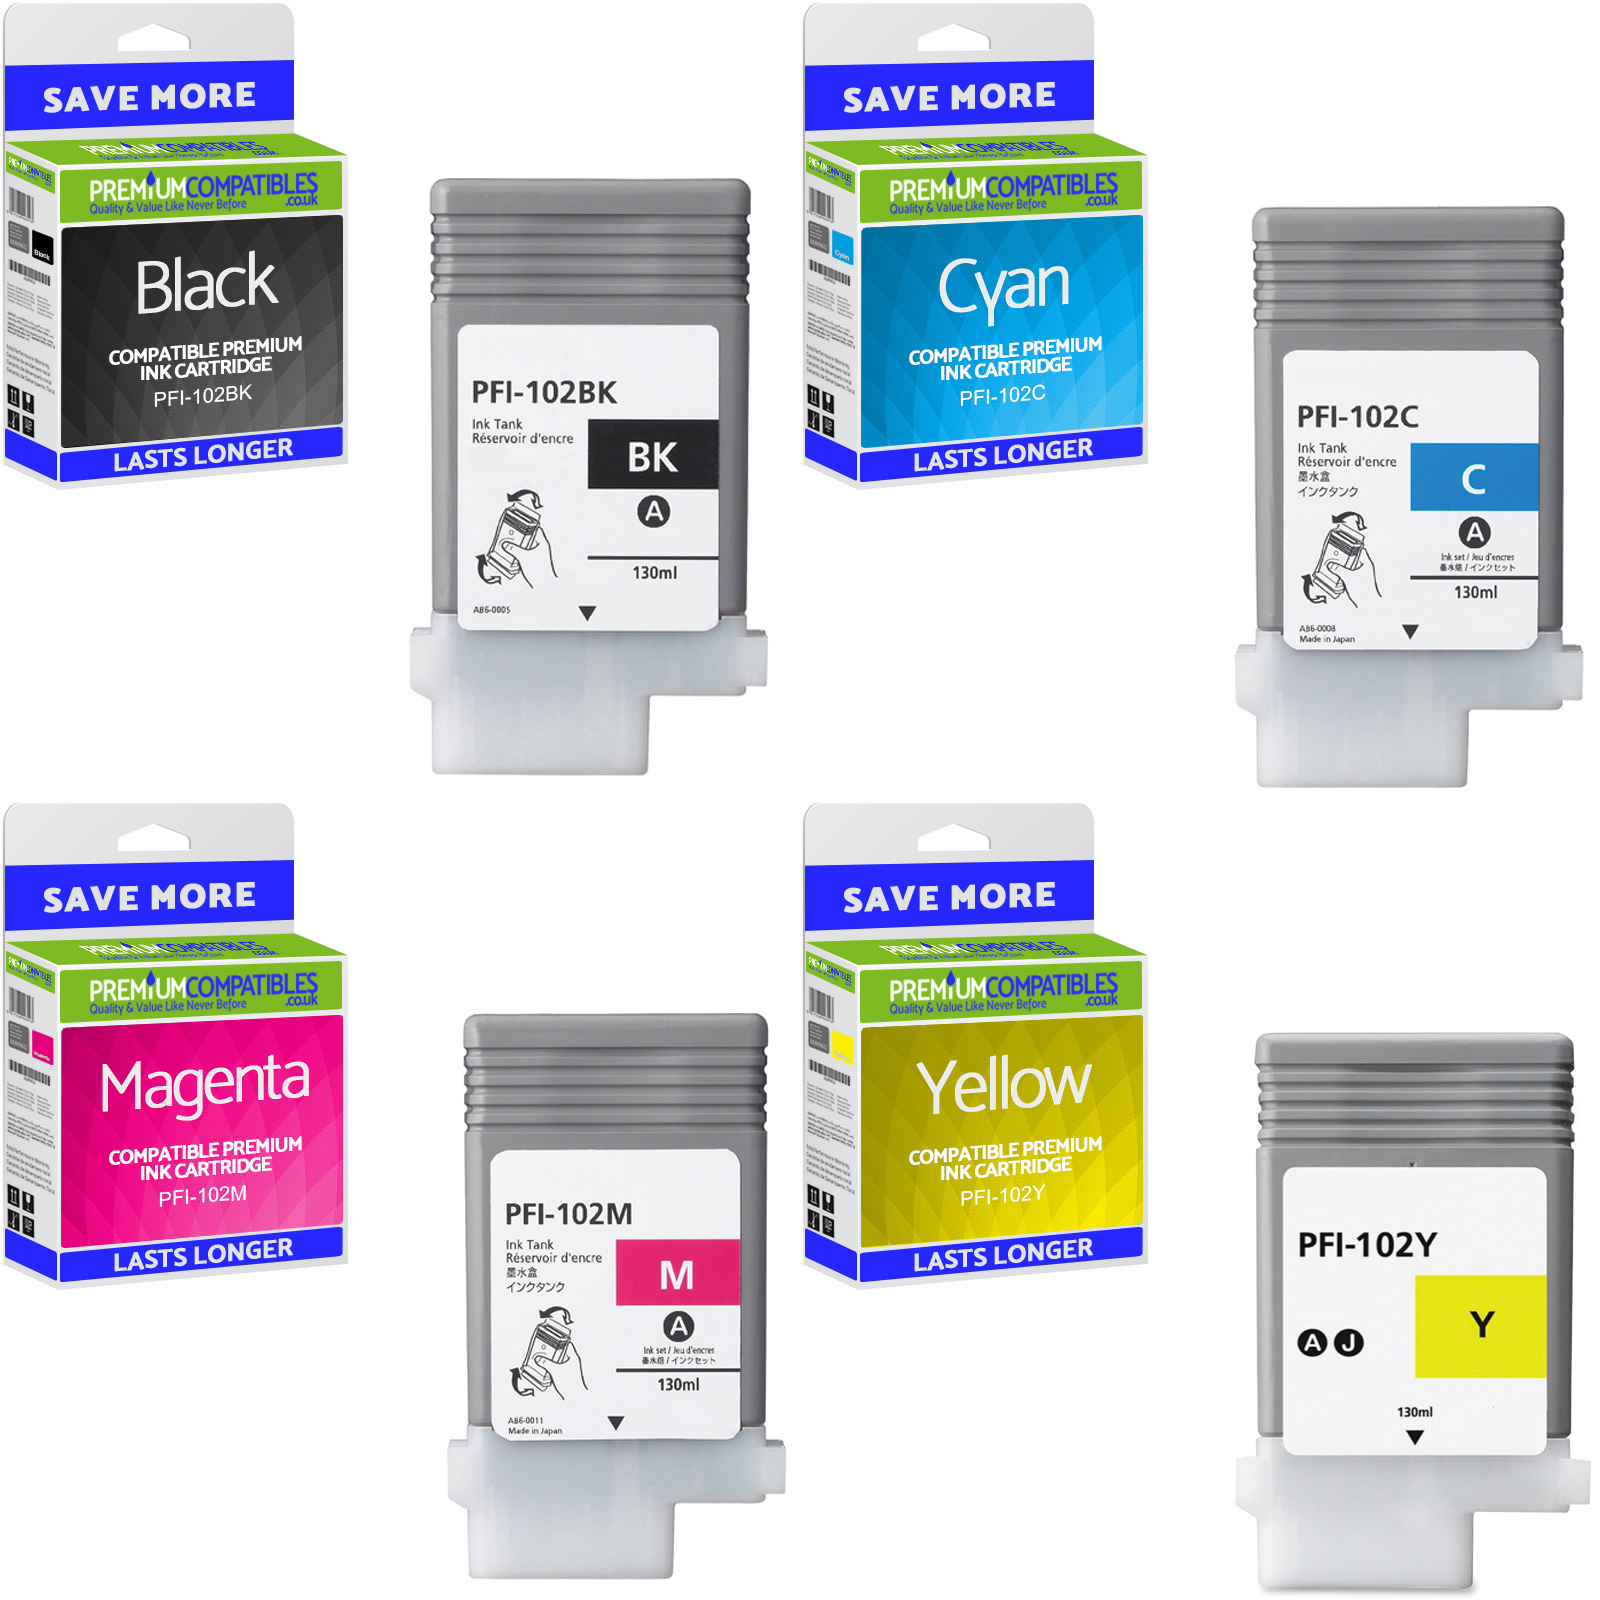 Premium Compatible Canon PFI-102 CMYK Multipack Ink Cartridges (0895B001 / 0896B001 / 0897B001 / 0898B001)